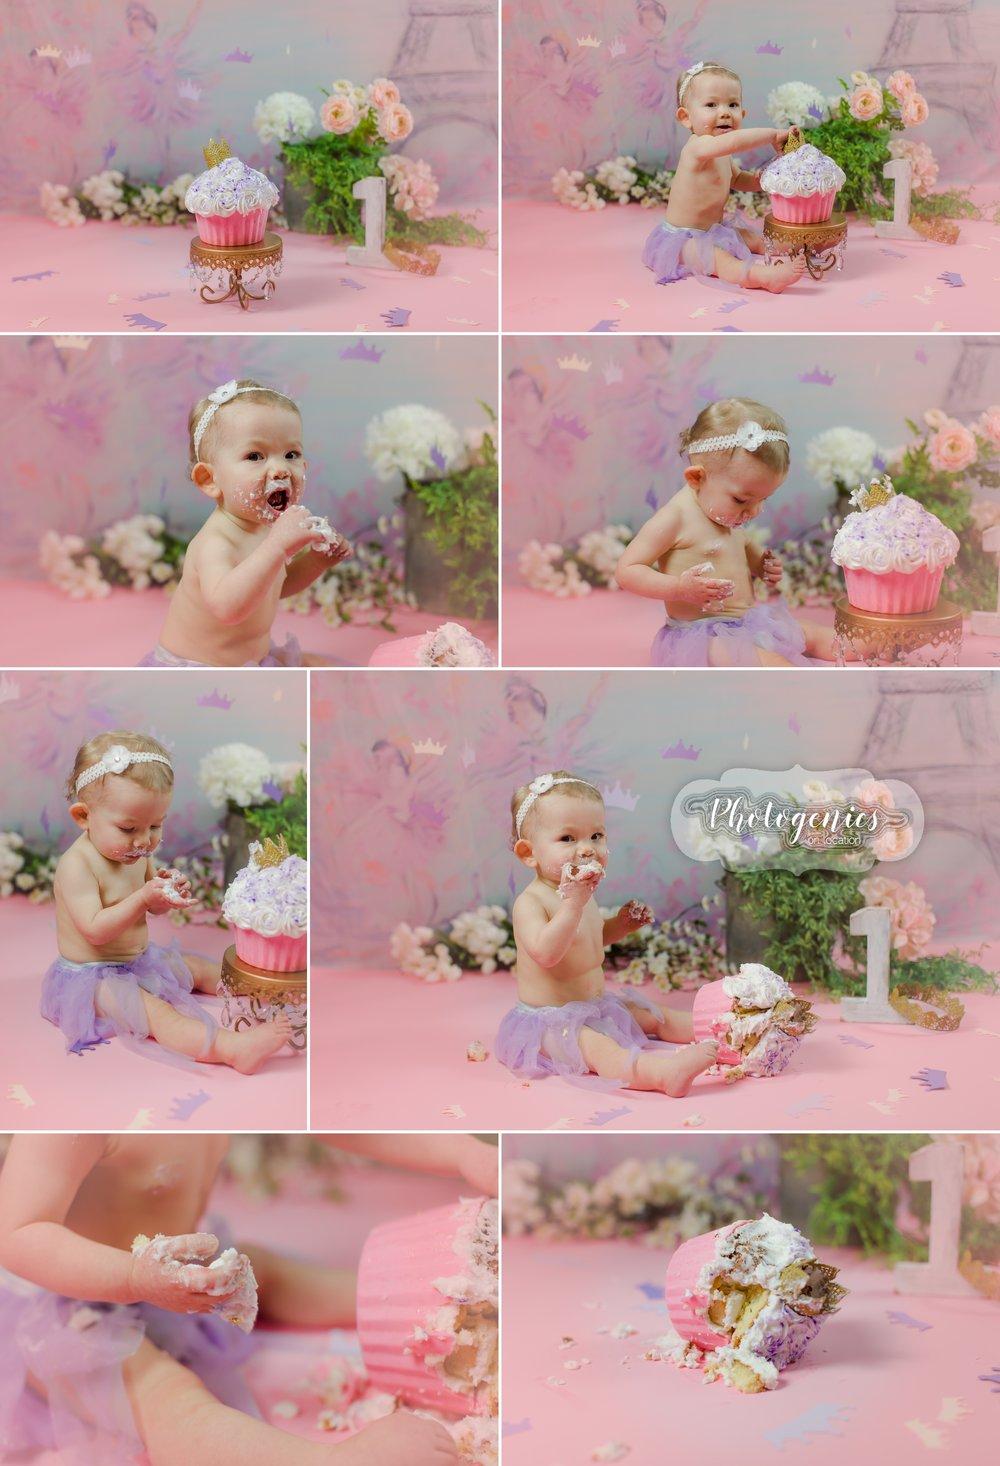 cakesmash_paris_girly_heidi_hope_backdrop_pink_crowns_princess_12_months_photography_st_louis_mo_photographer_cake_smash_first_bday